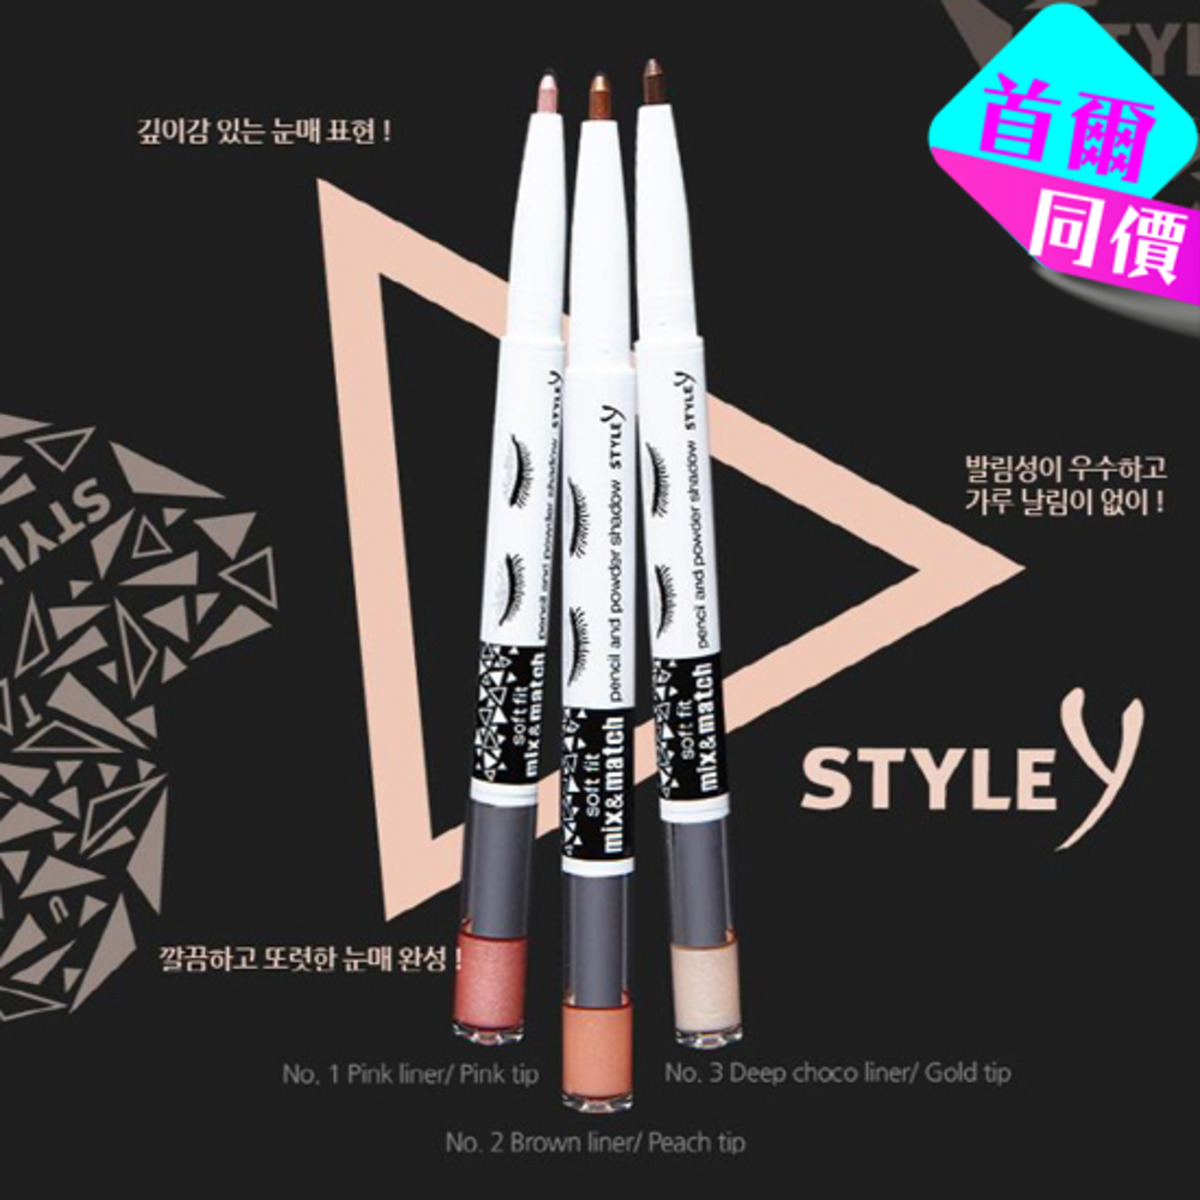 Style Y 混合配襯眼線筆/眼影粉